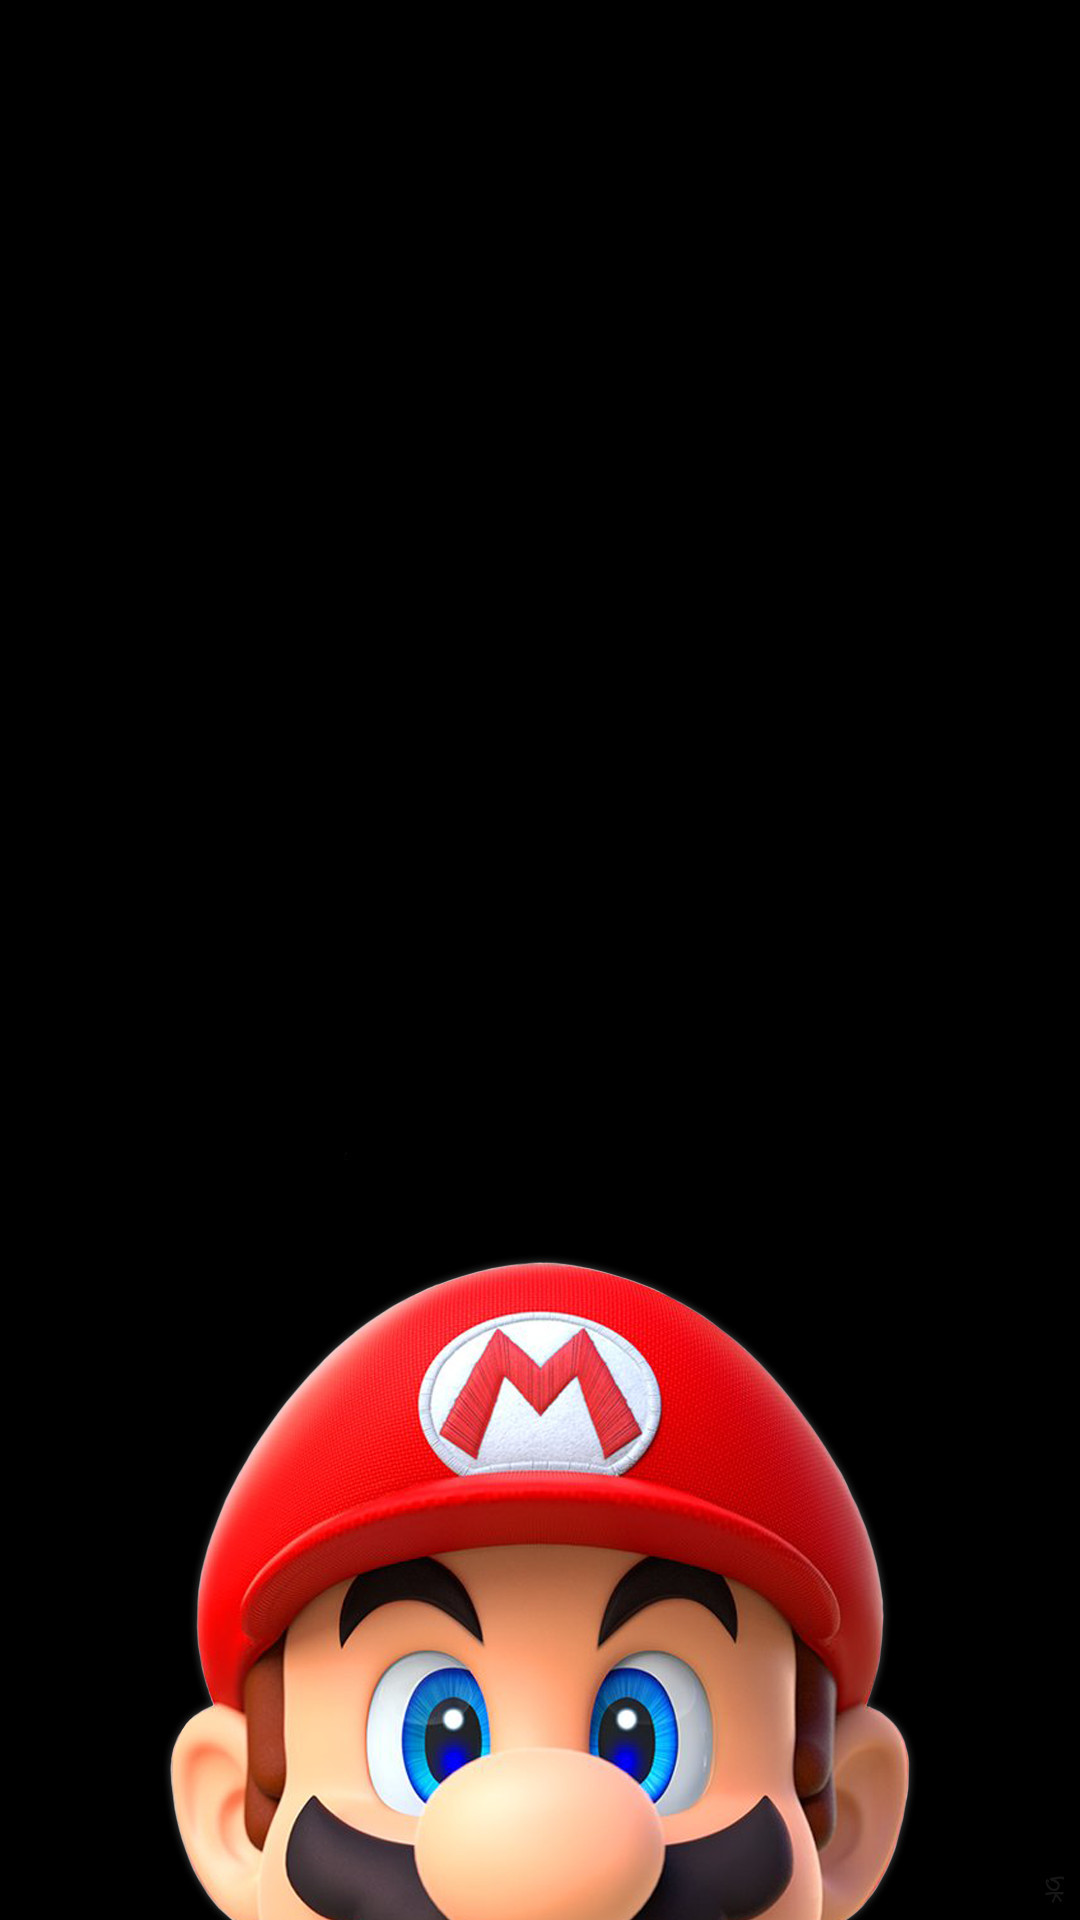 Res: 1080x1920, 1920x1440 Mario, mushrooms, Super Mario Bros., 7up, punny - Free Wallpaper  / WallpaperJam.com